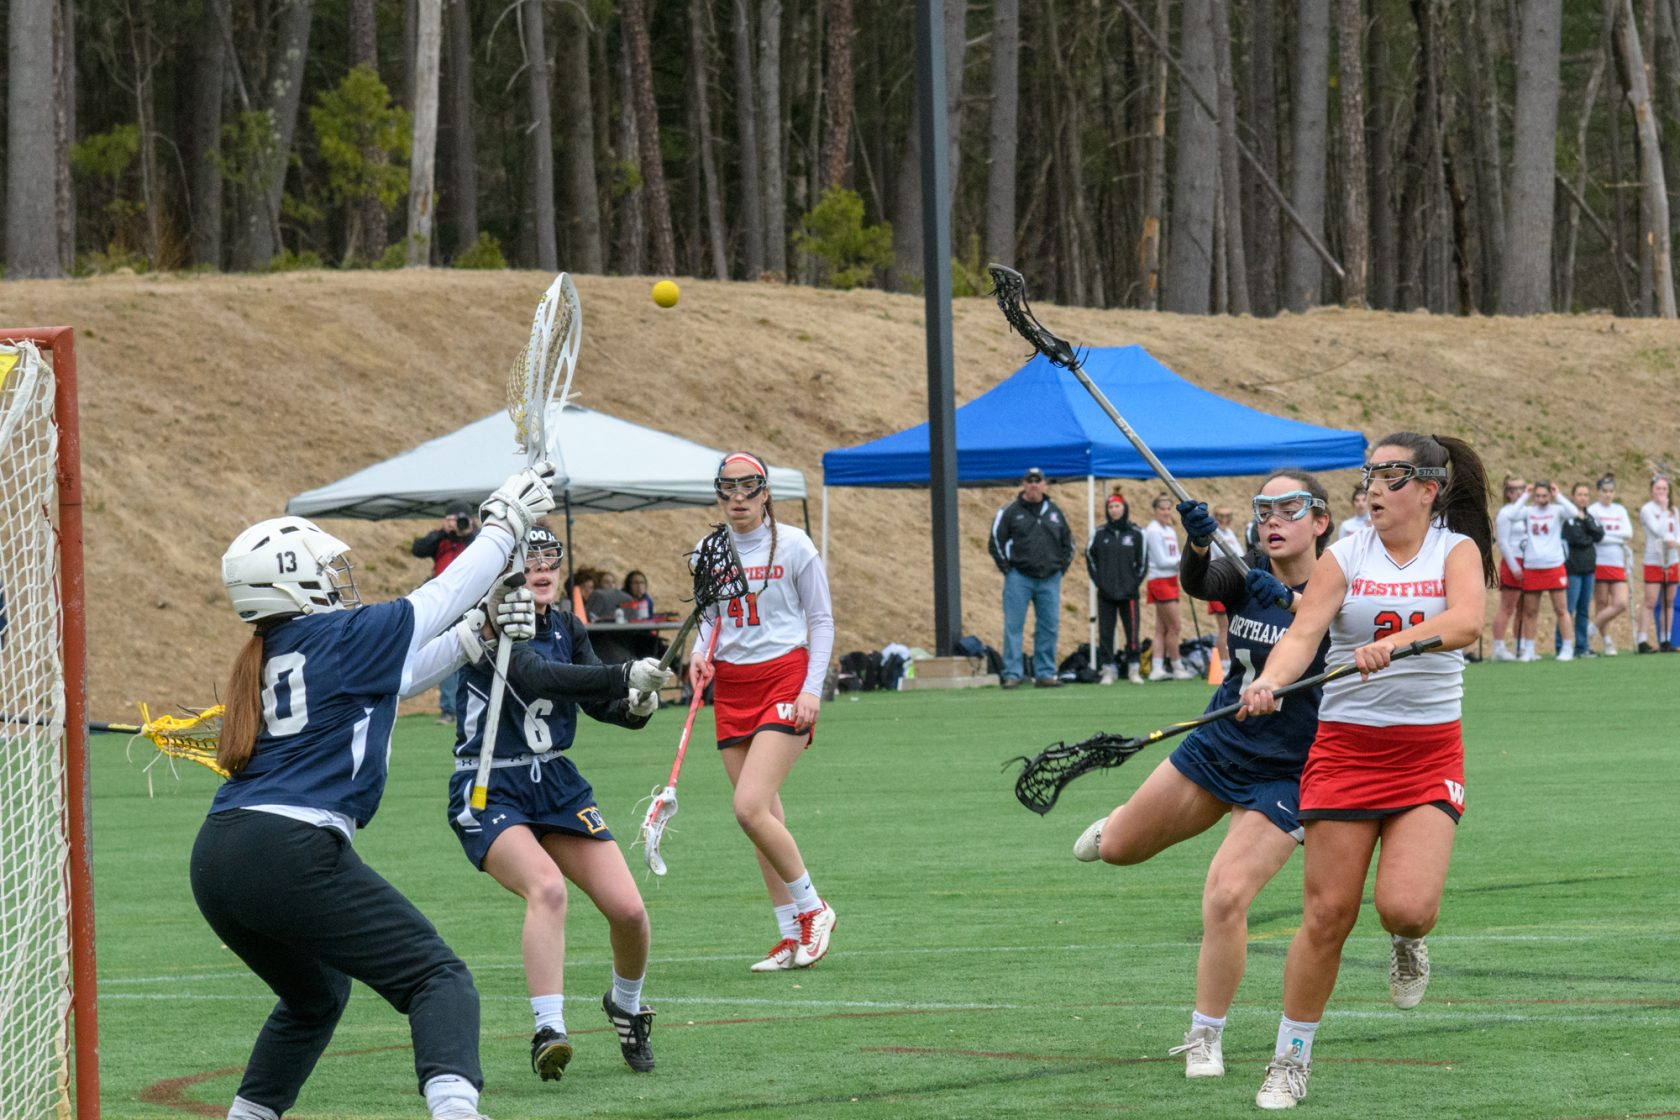 Westfield girls lacrosse Morgan Anjos vs  Northampton - The